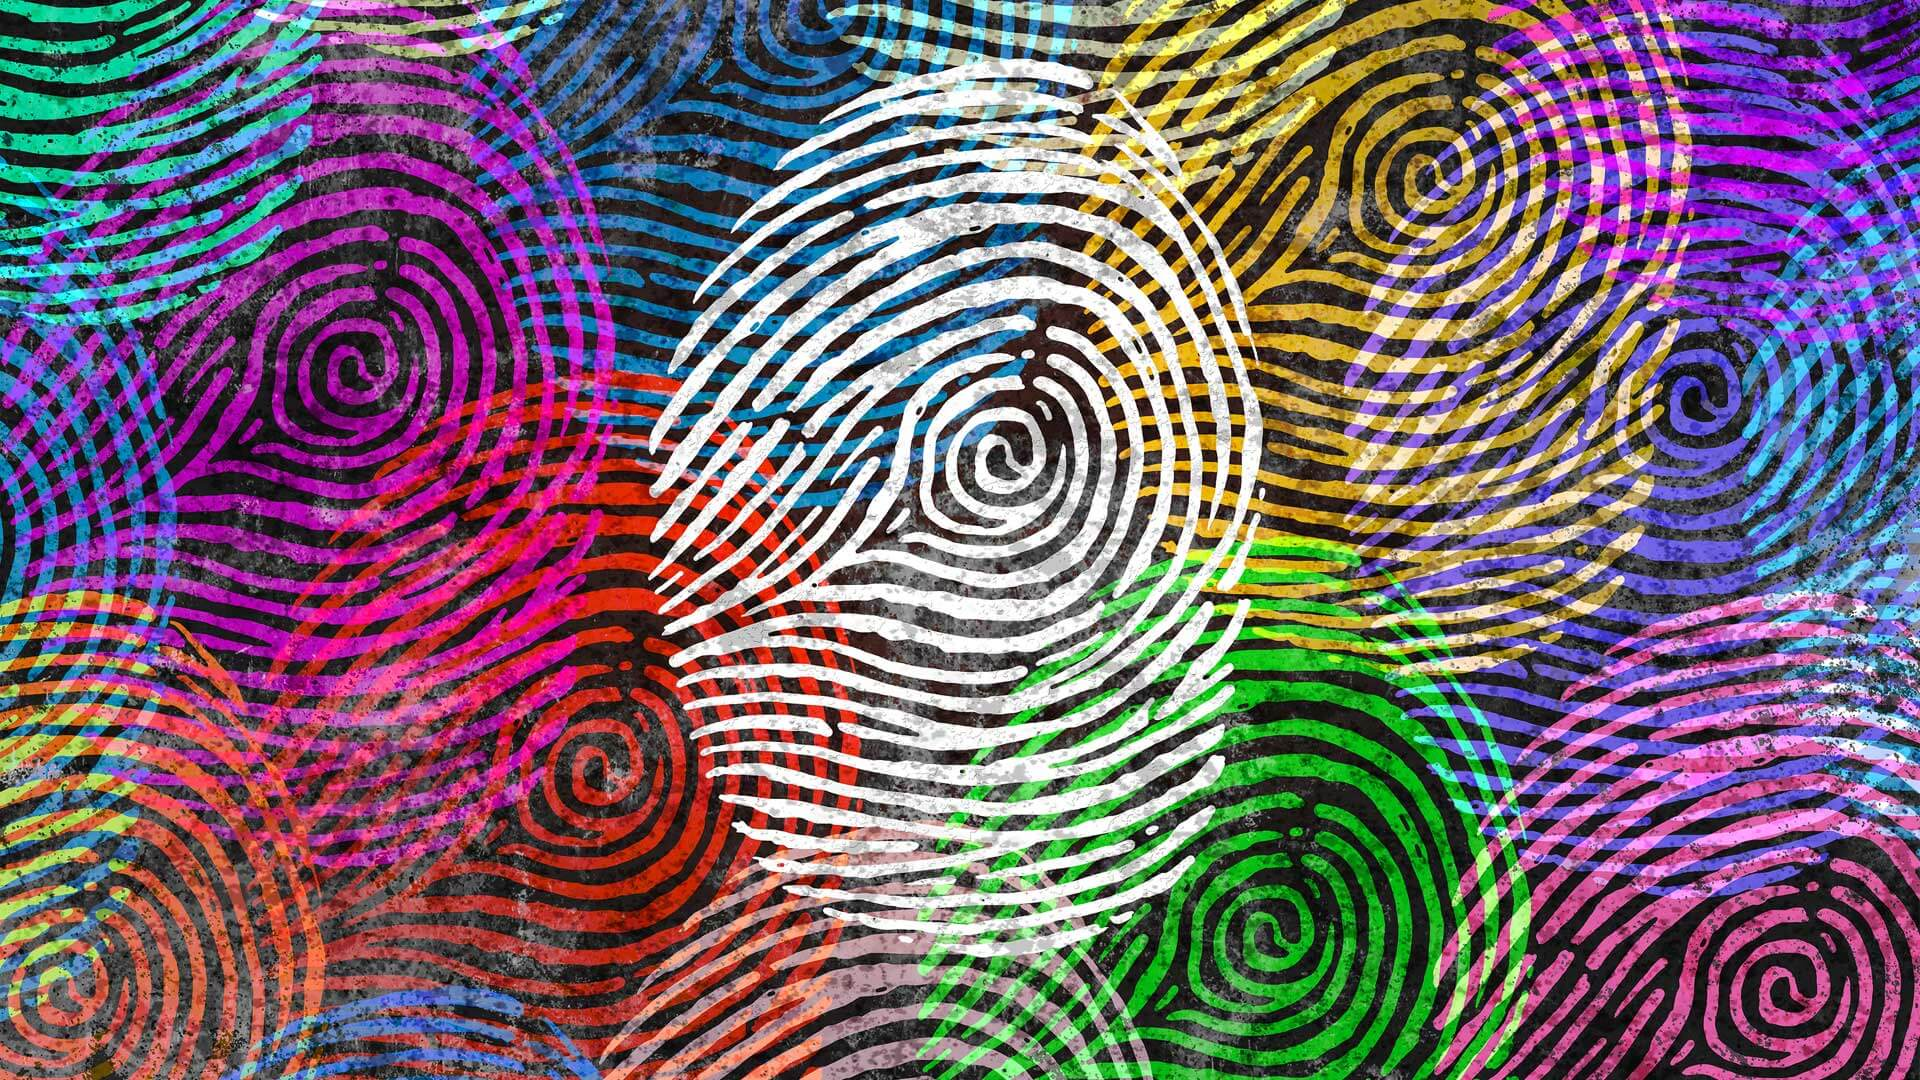 Colorado Fingerprinting Services